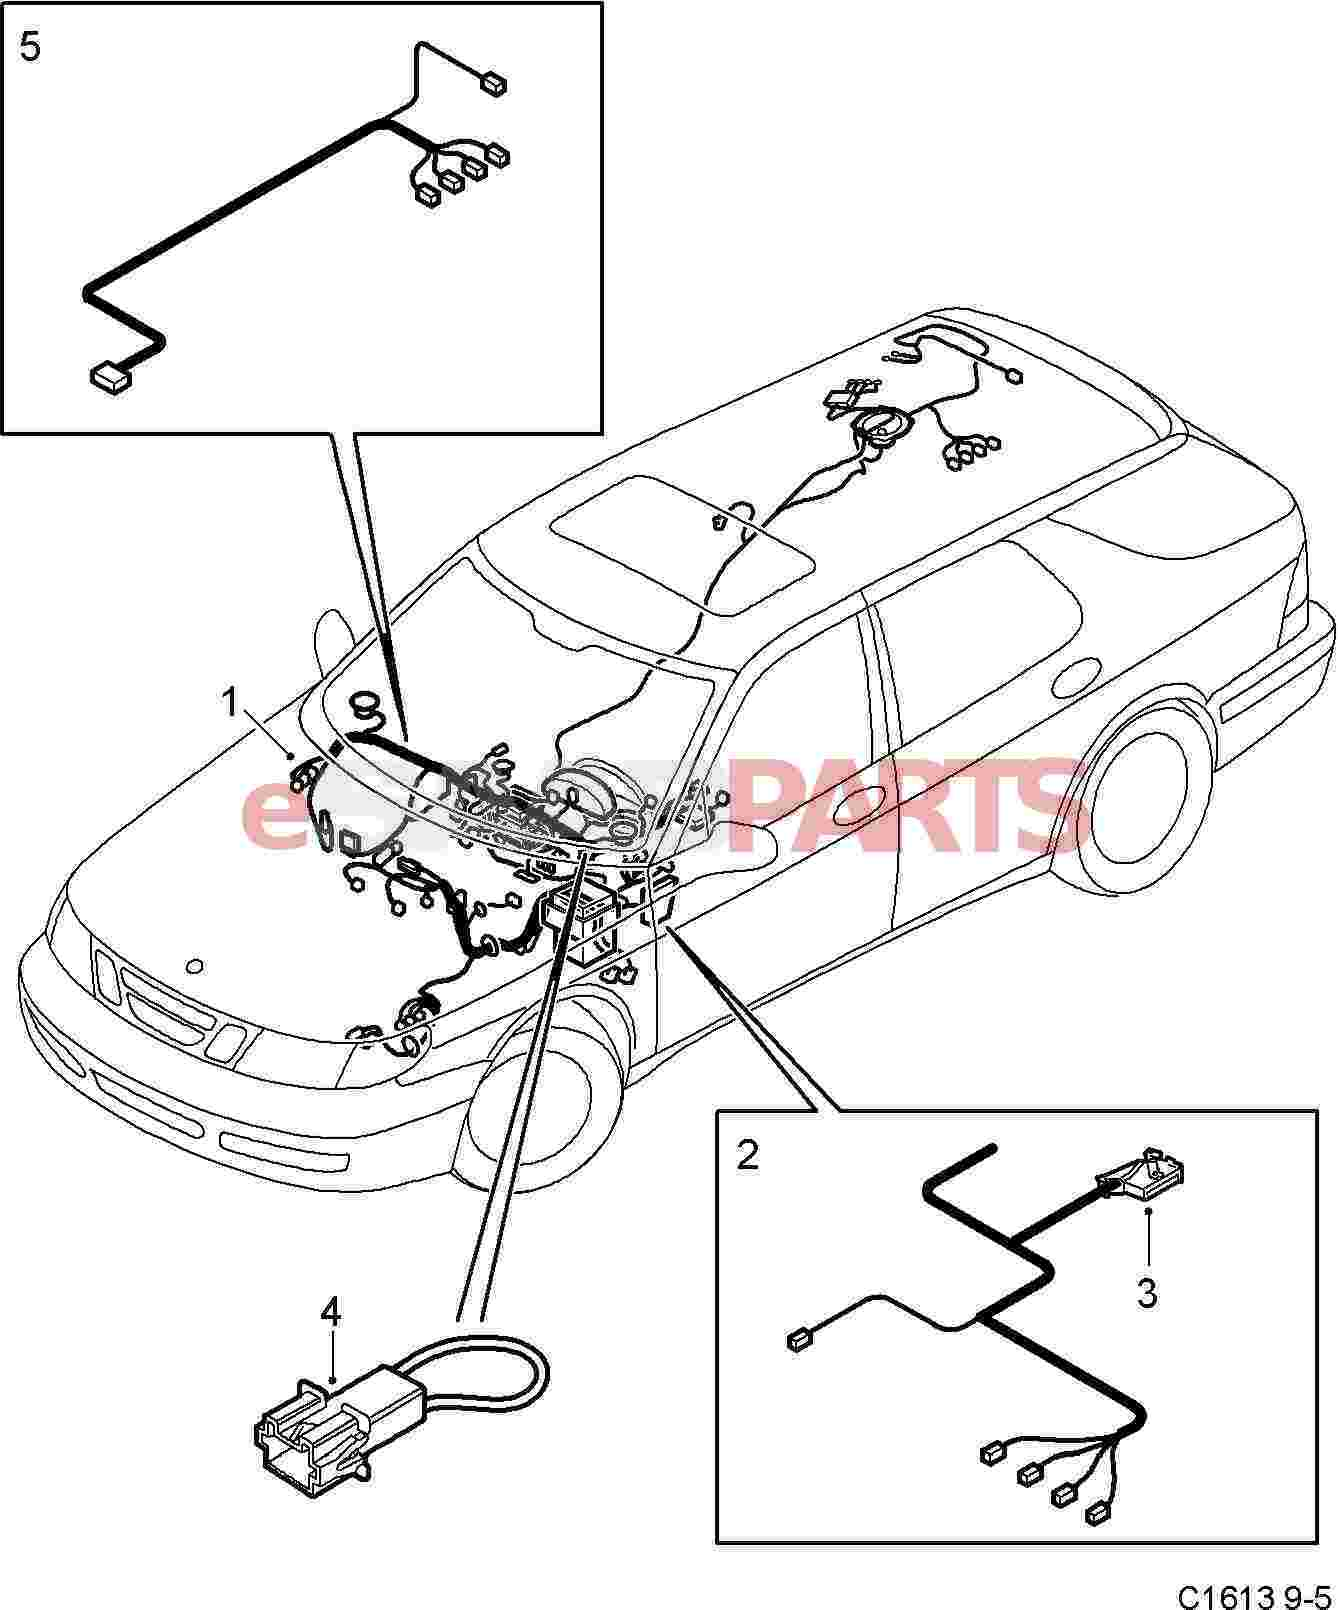 Wiring harness instrument panel